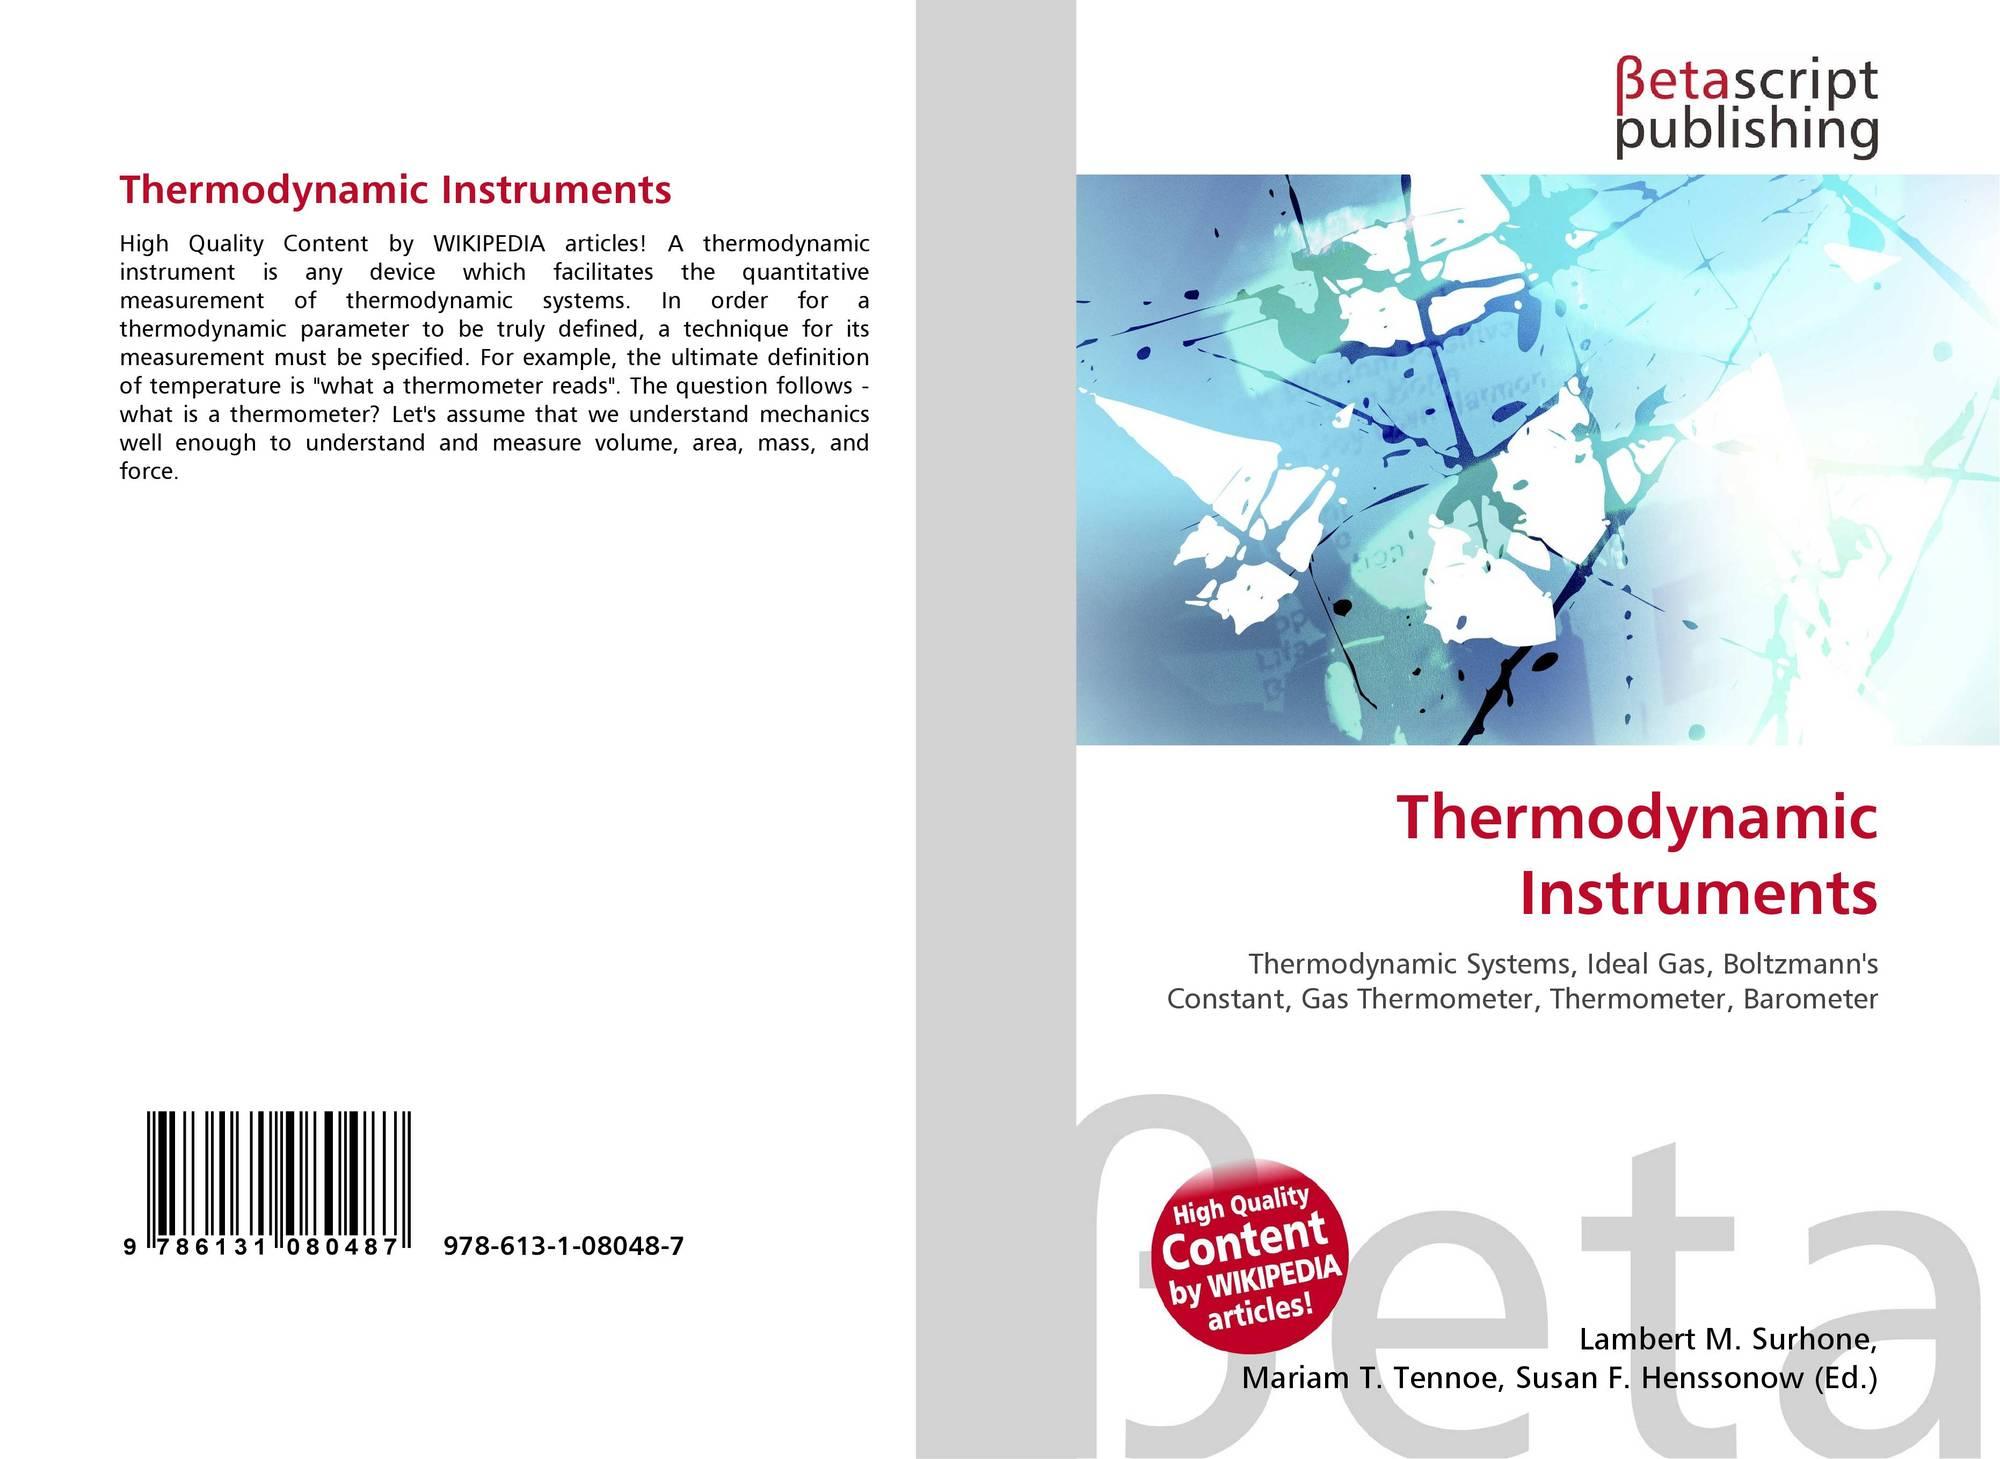 thermodynamic instruments 978 613 1 08048 7 6131080488 9786131080487